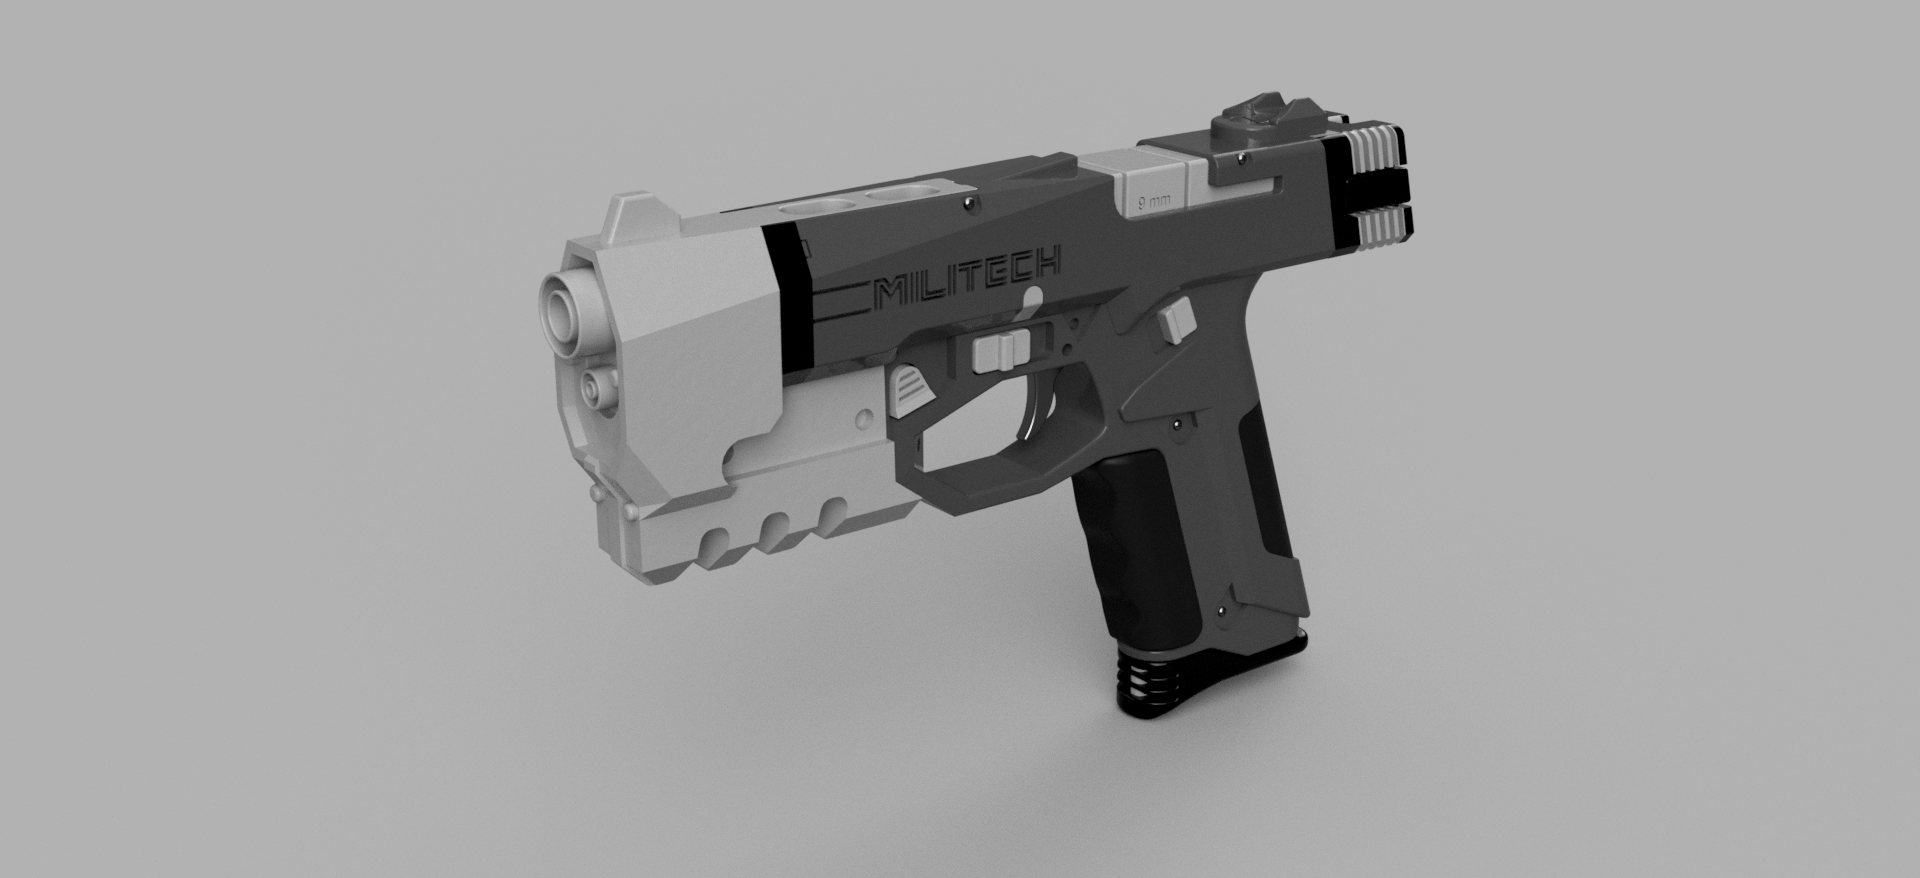 CyberPunk Militech Pistol v19.png